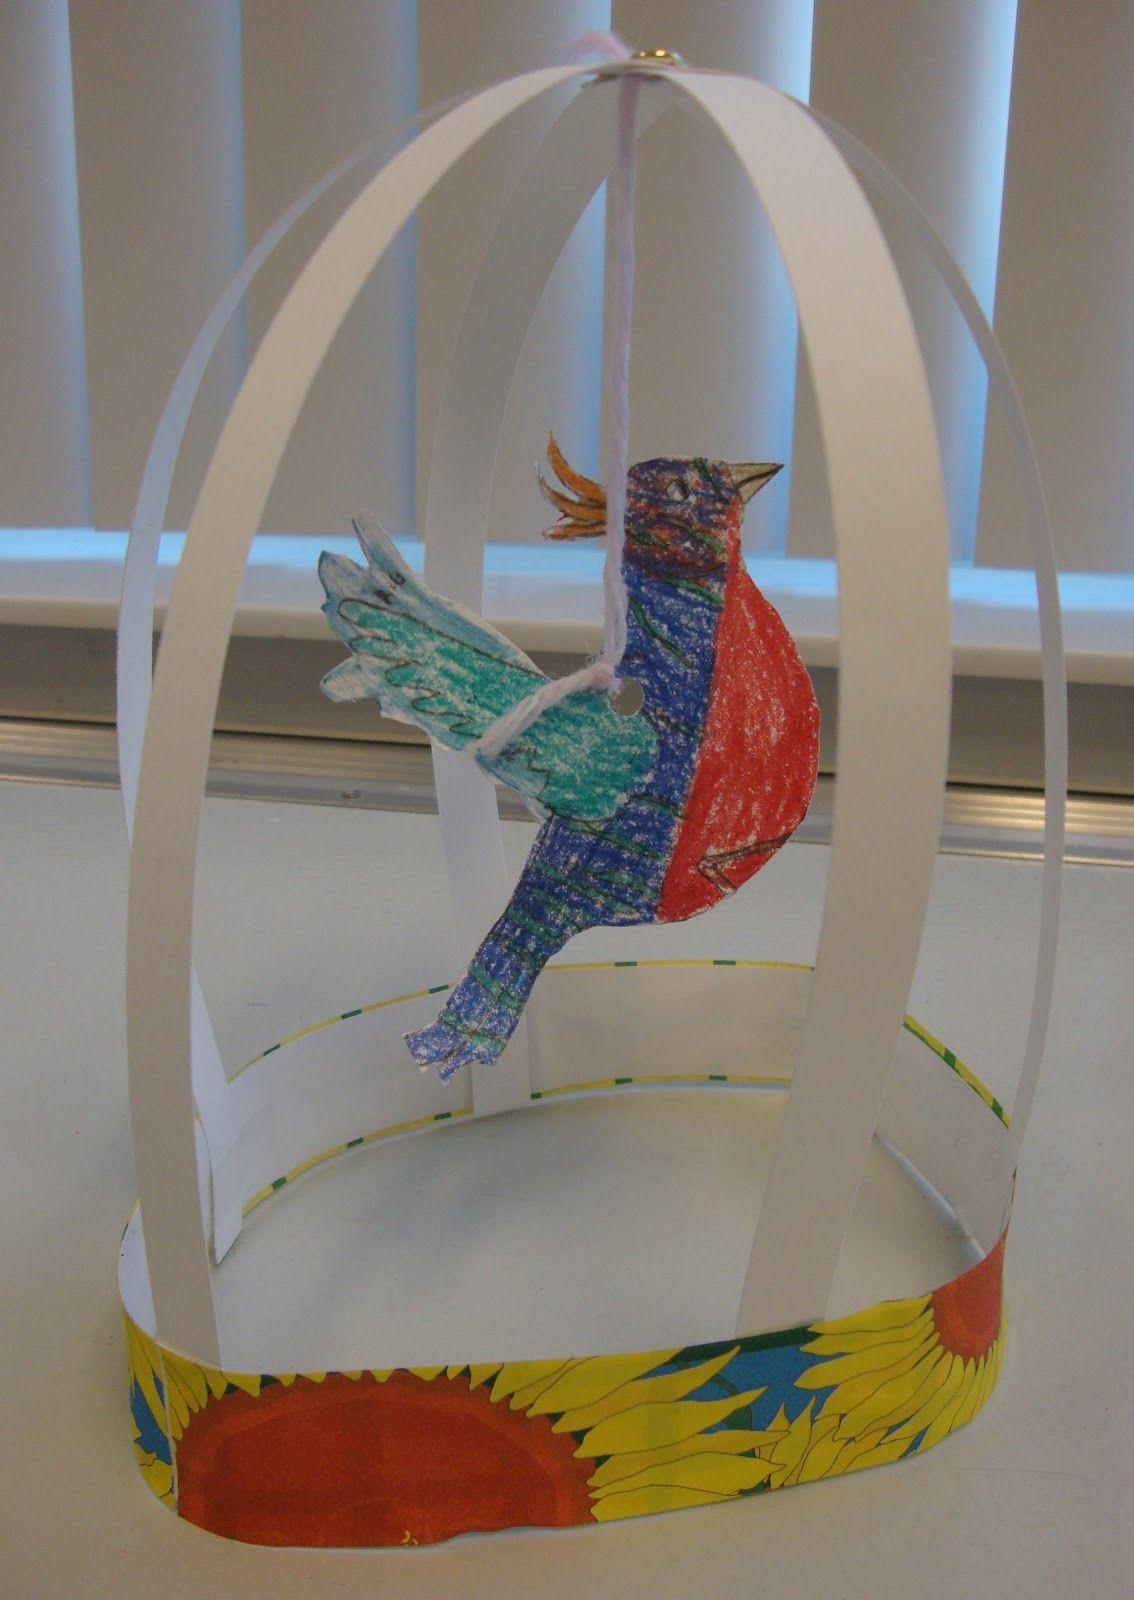 Art paper scissors glue bird cage sculptures bird